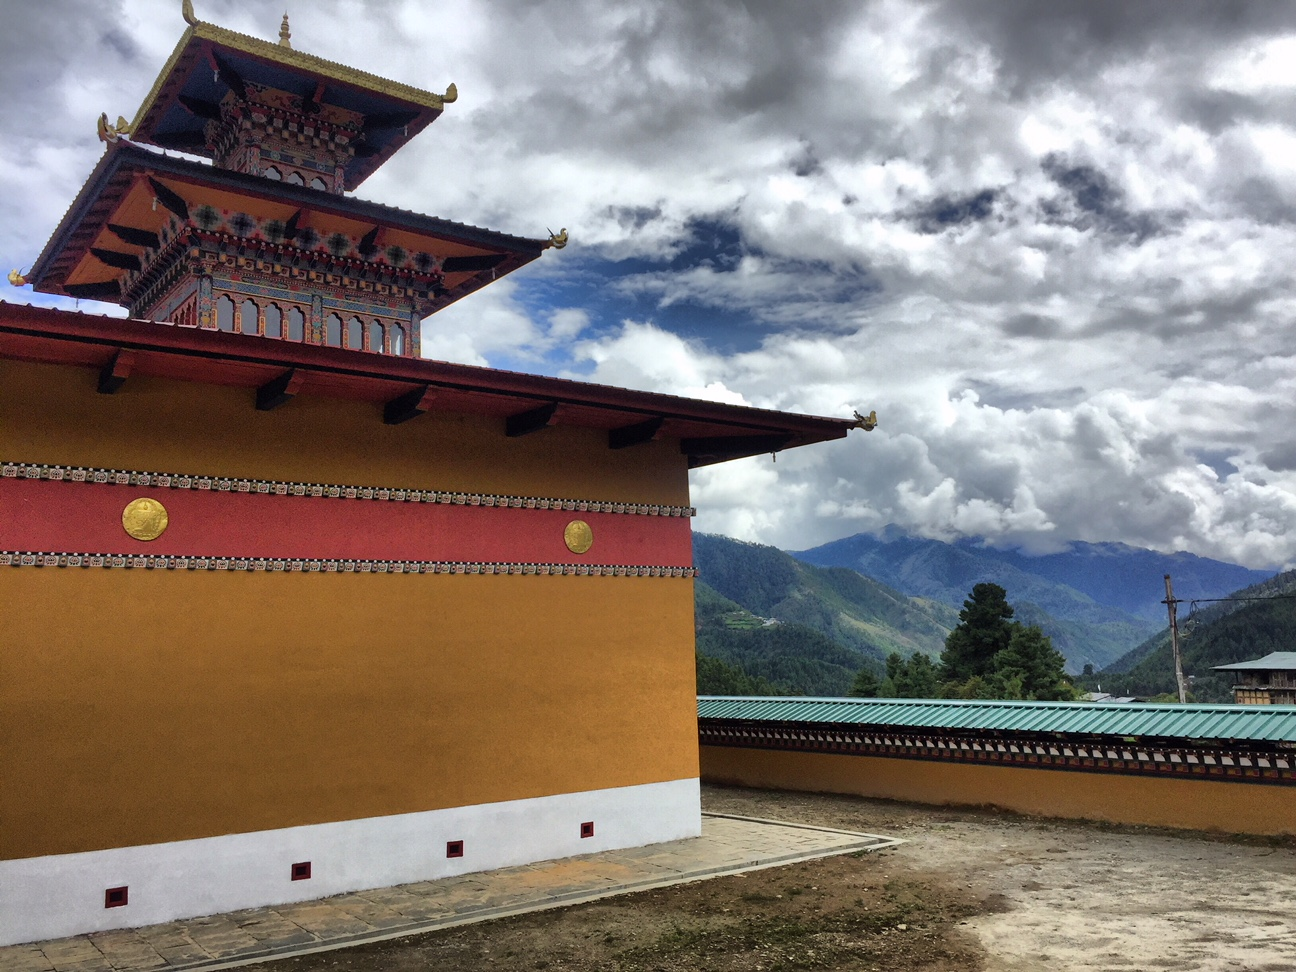 Traumreise Bhutan Trekking Himalaya Jomolhari Wandern Gebirge Westen Haa